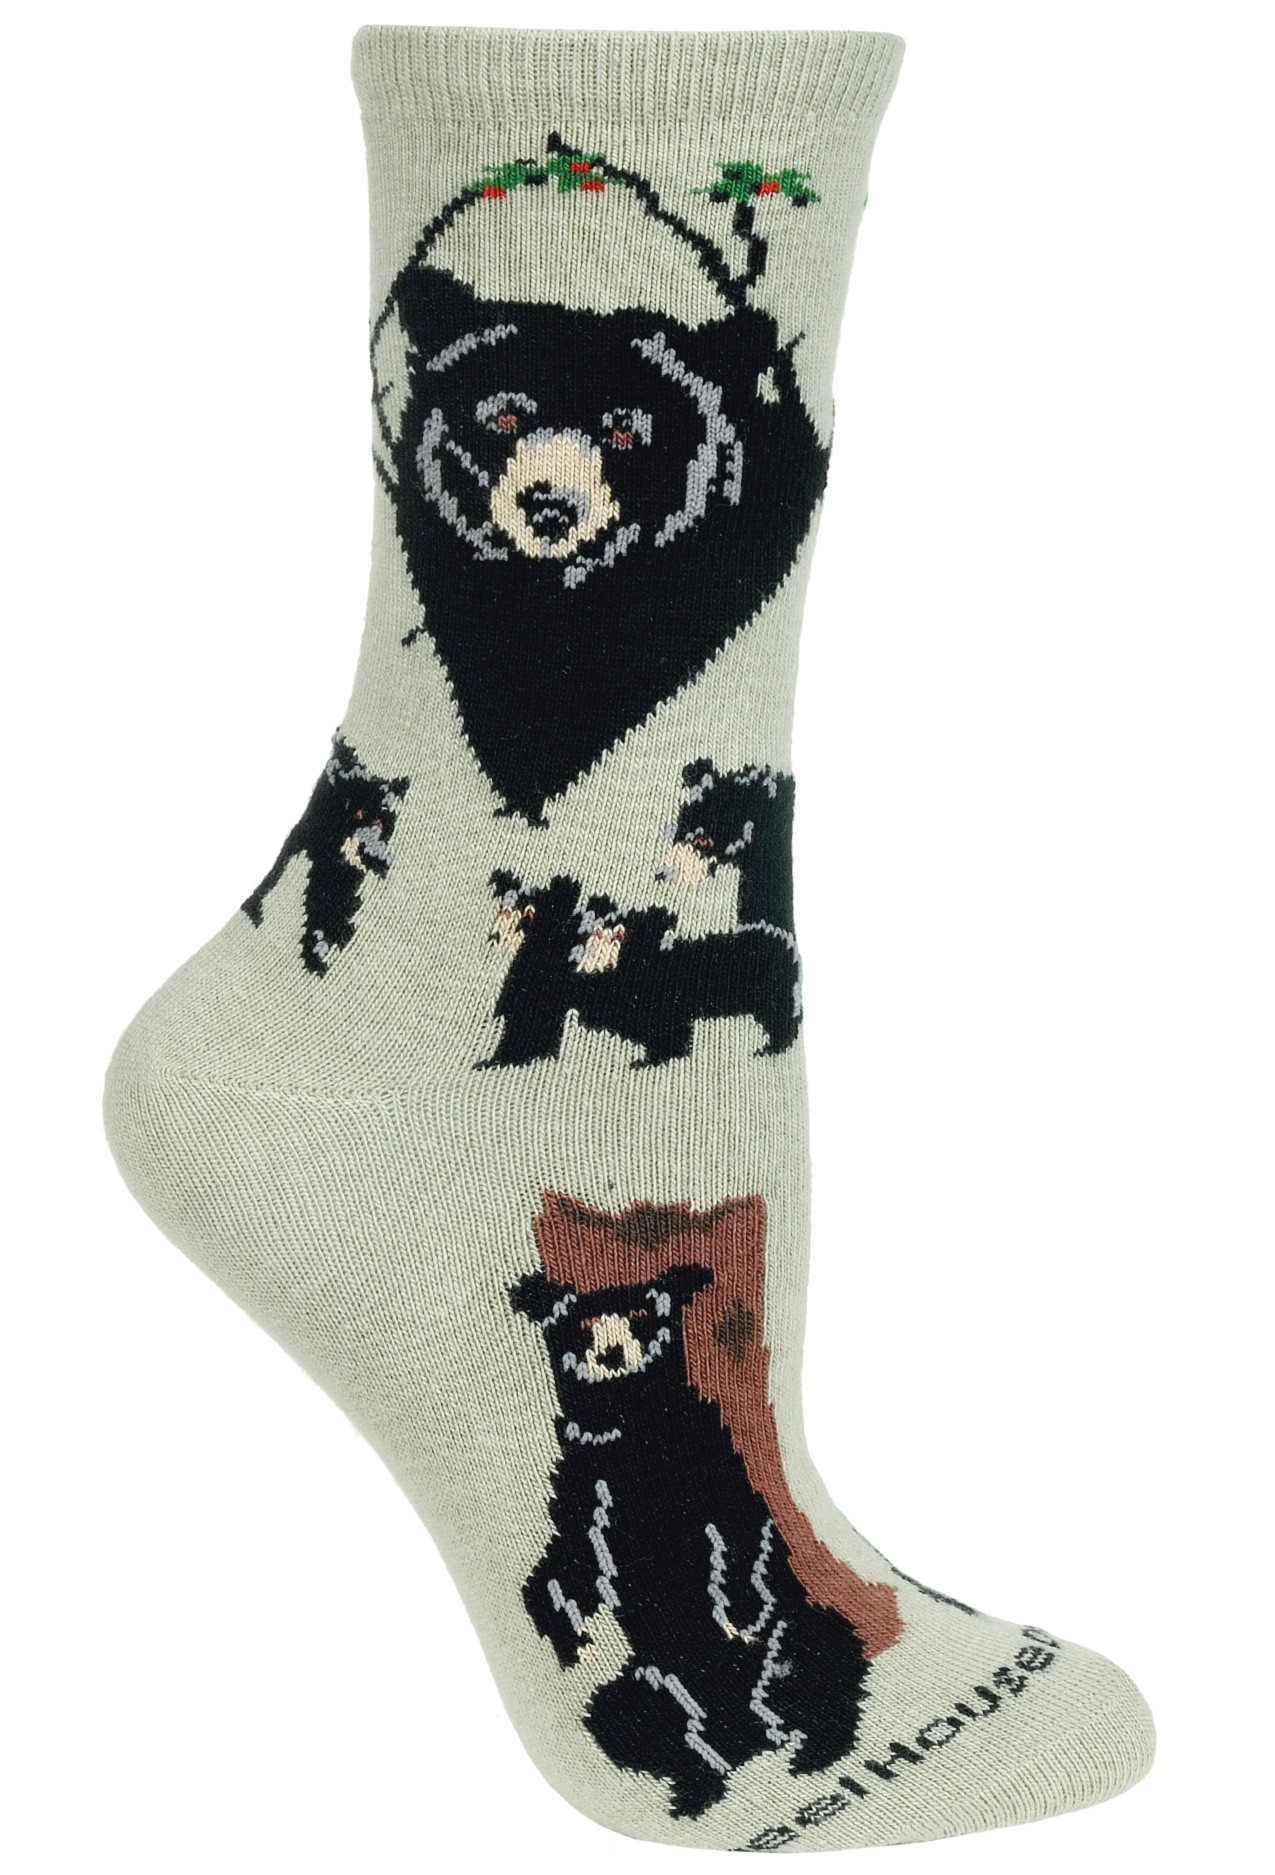 Https D3d71ba2asa5oz Cloudfront Net 53000257 Images Ph1474m Bearblack Mf Jpeg Socks Women Socks Black Bear